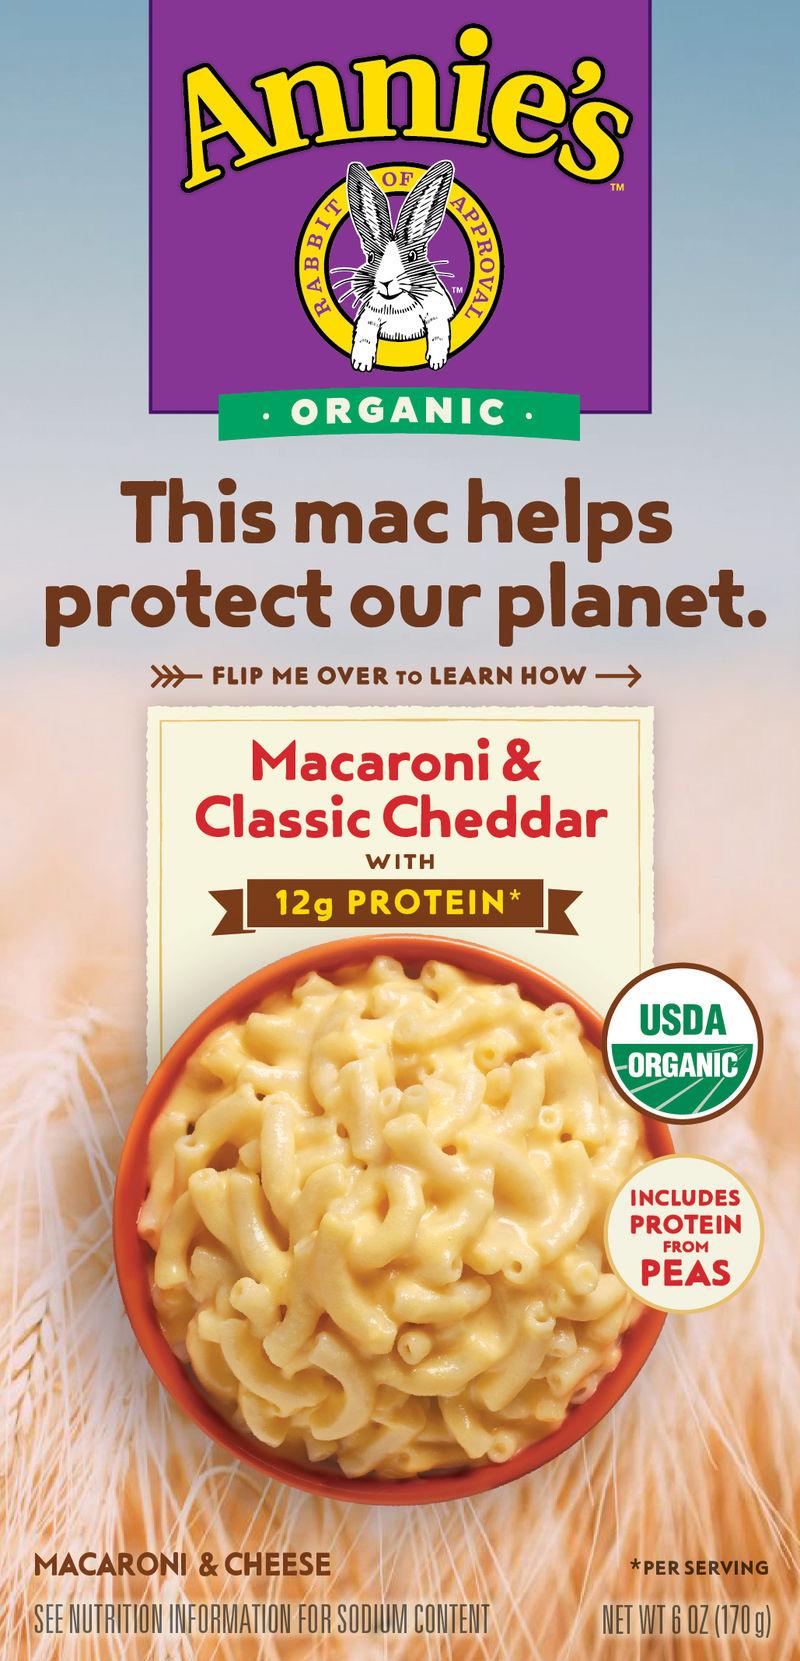 Planet-Friendly Mac & Cheese